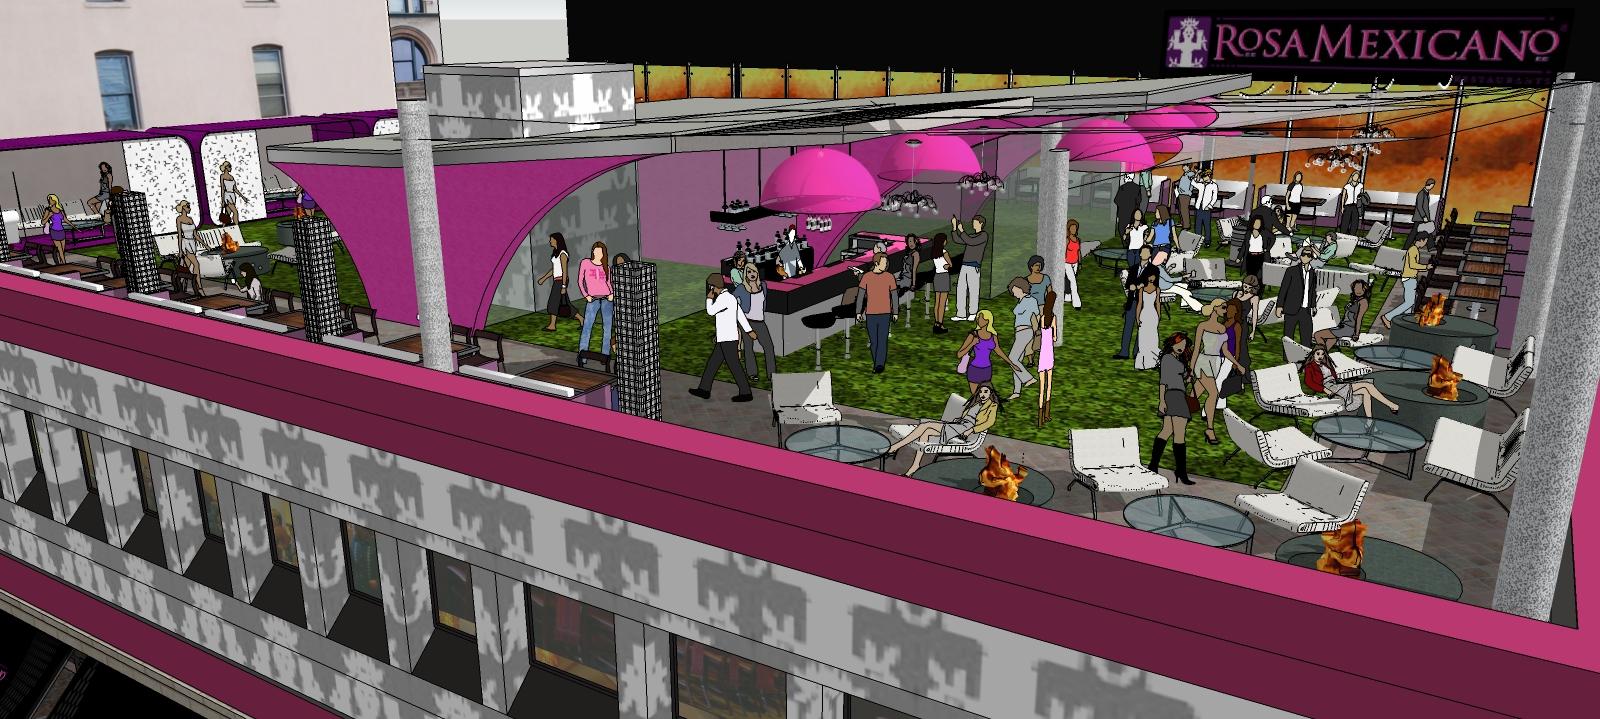 411_model-rosa-mexicano-b.jpg